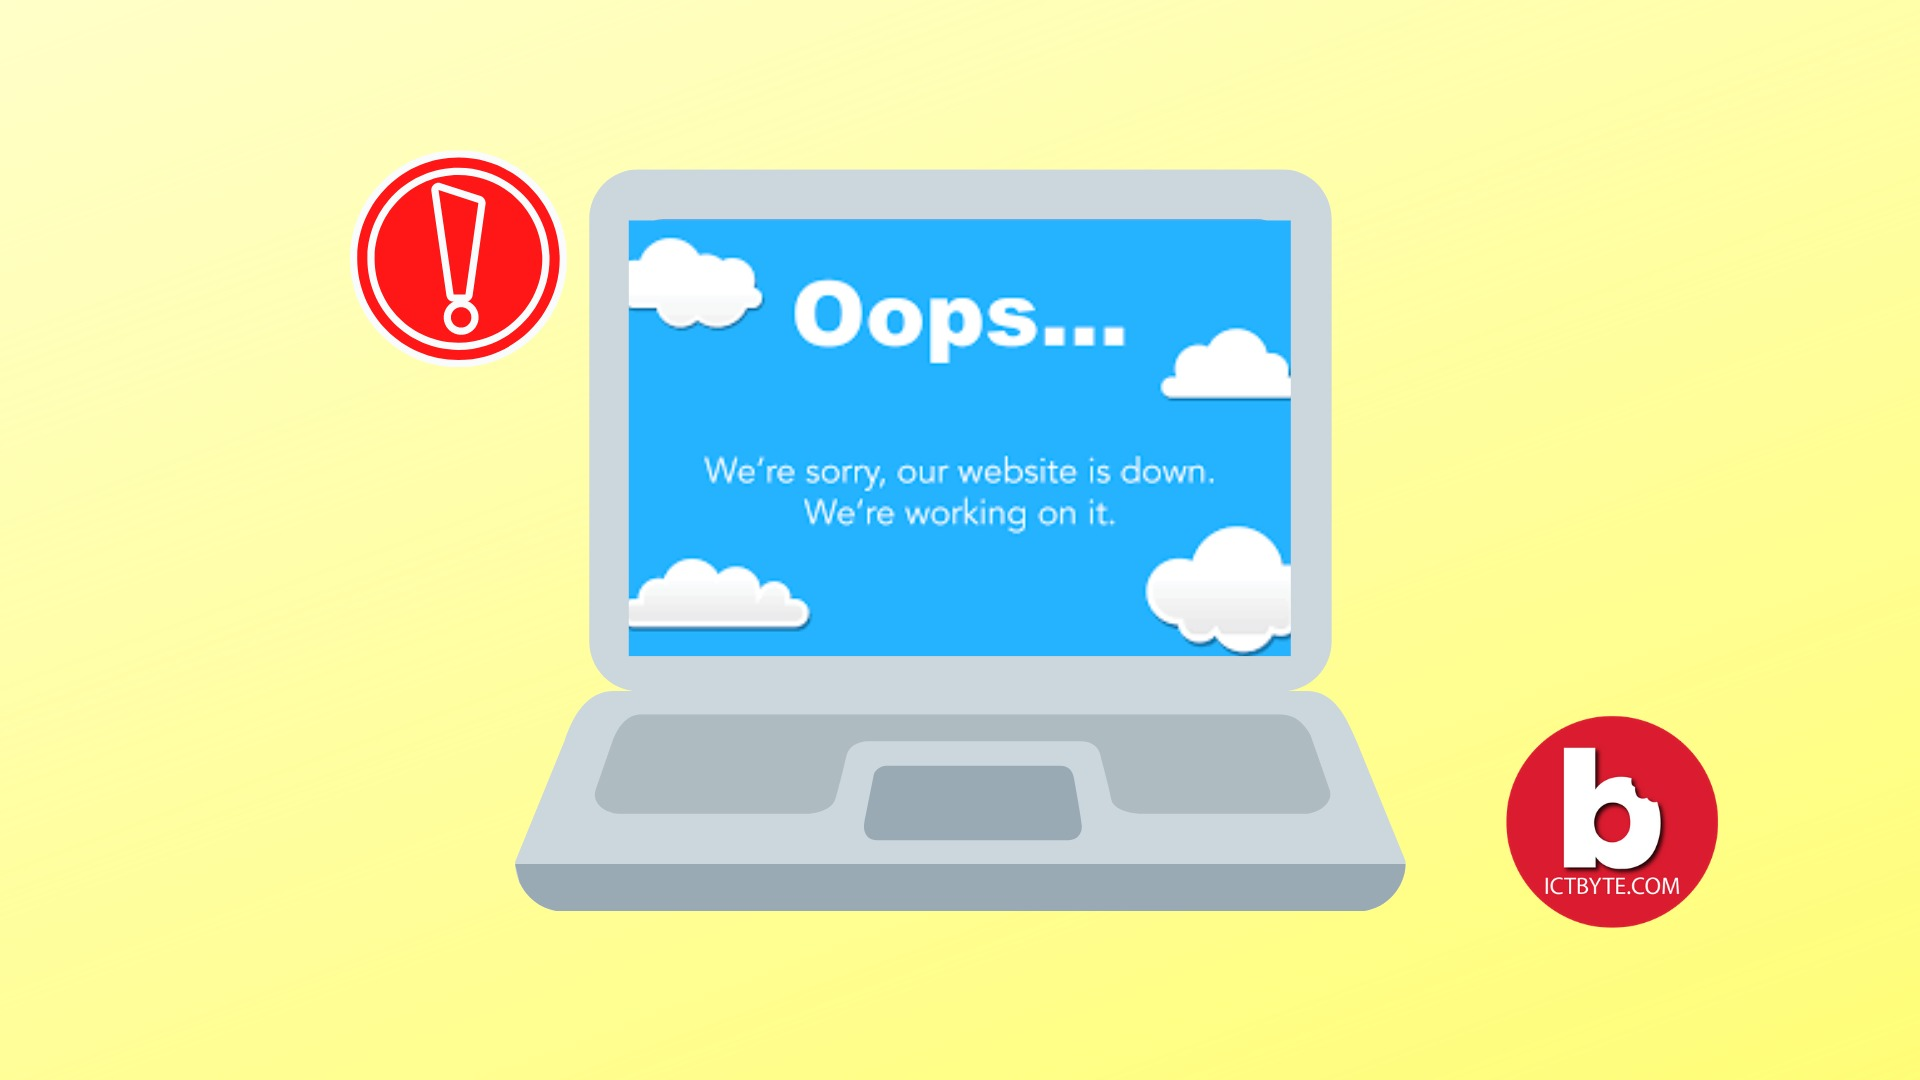 YOUR WEBSITE IS DOWN